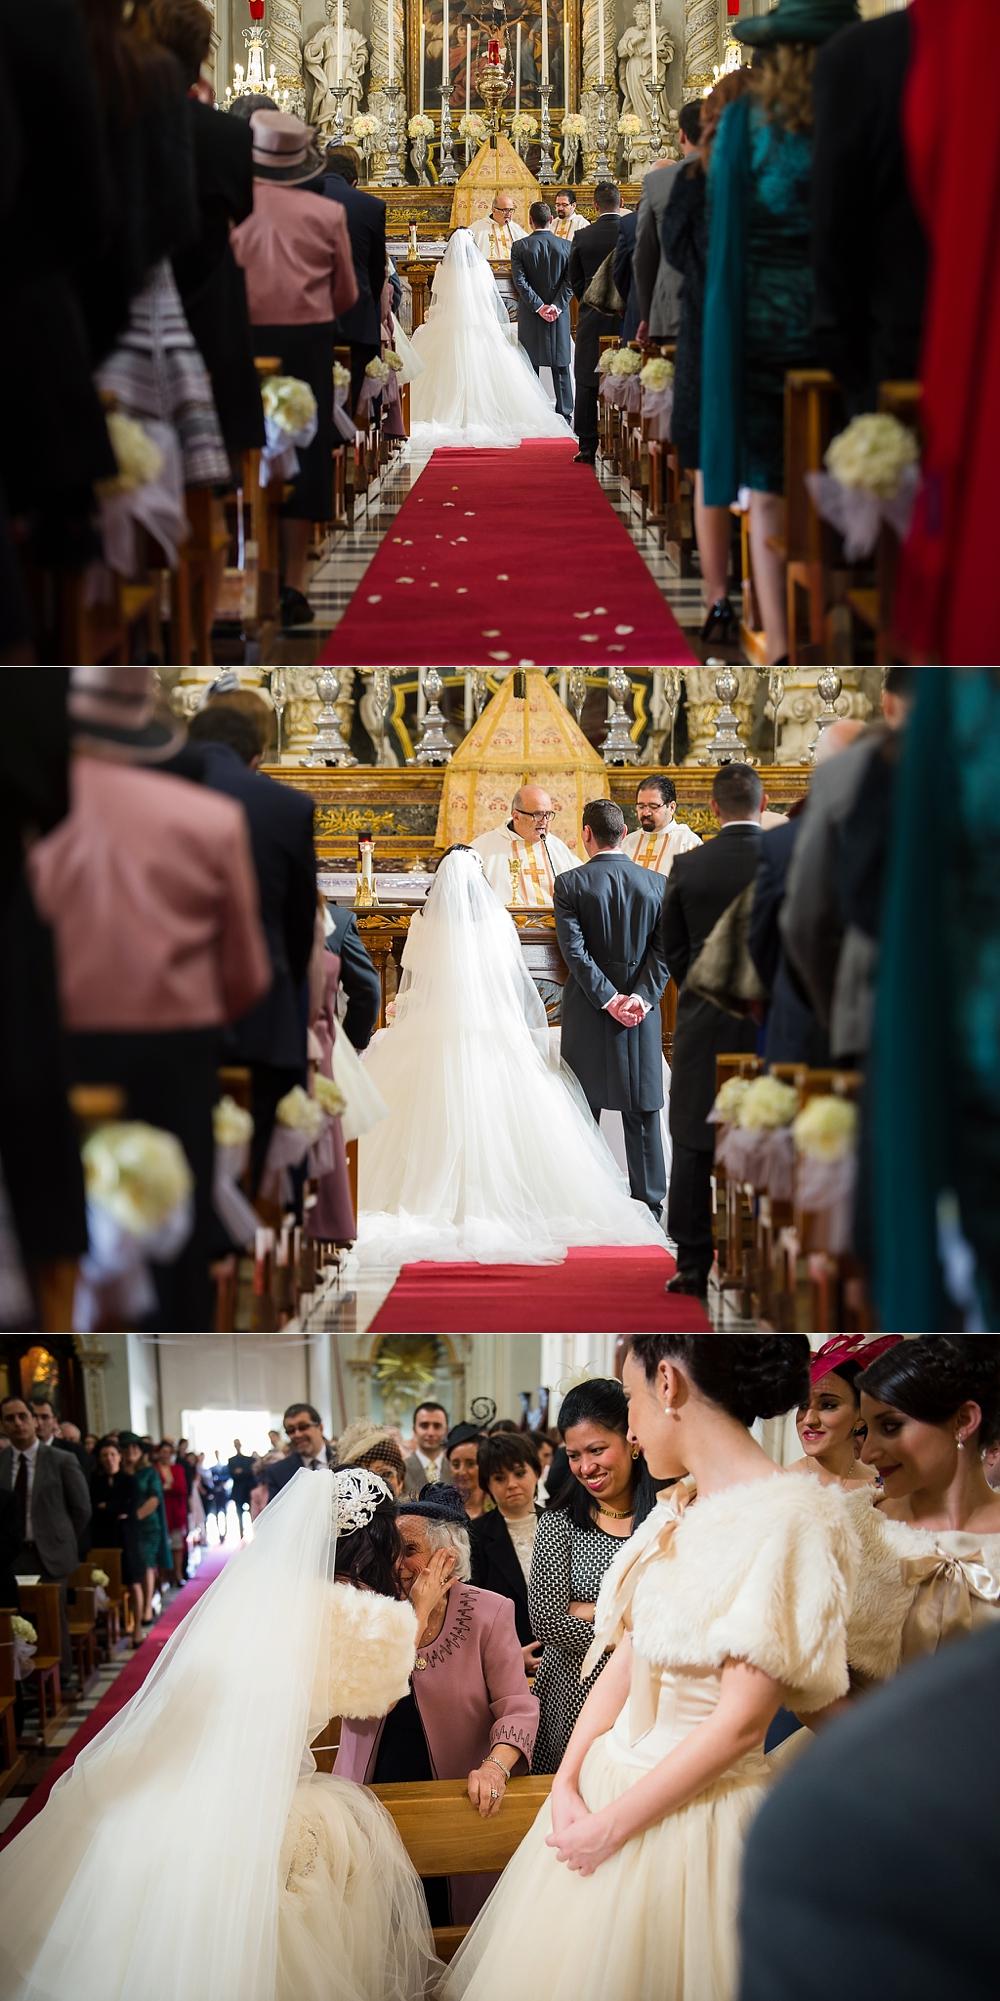 Wedding Photography Malta - Shane P Watts - Palazzo Parisio Wedding